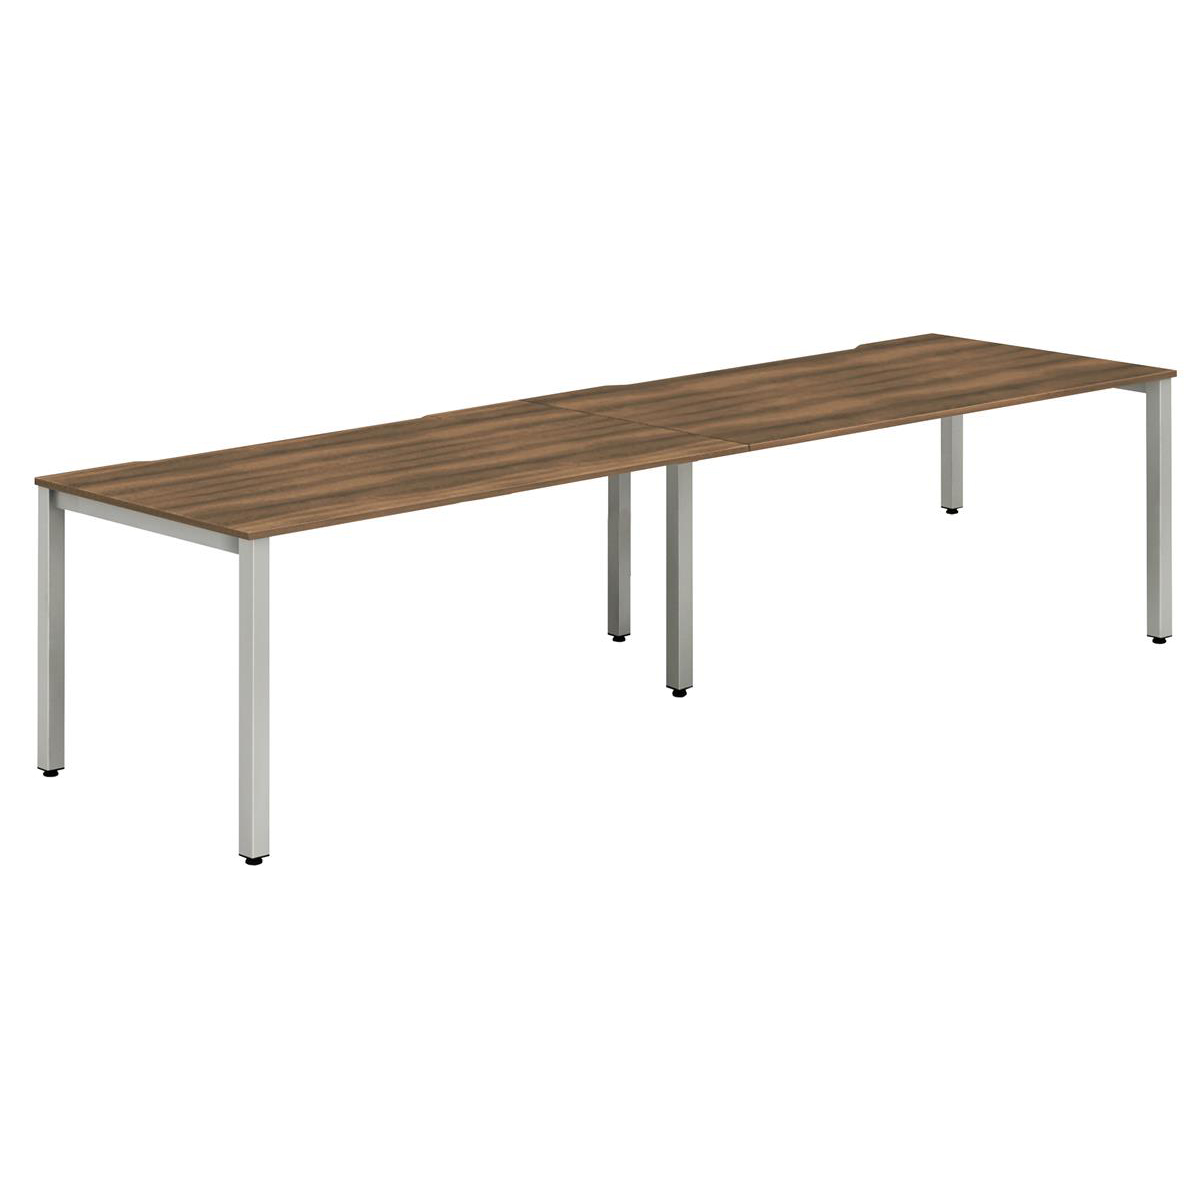 Trexus Bench Desk 2 Person Side to Side Configuration Silver Leg 2400x800mm Walnut Ref BE379